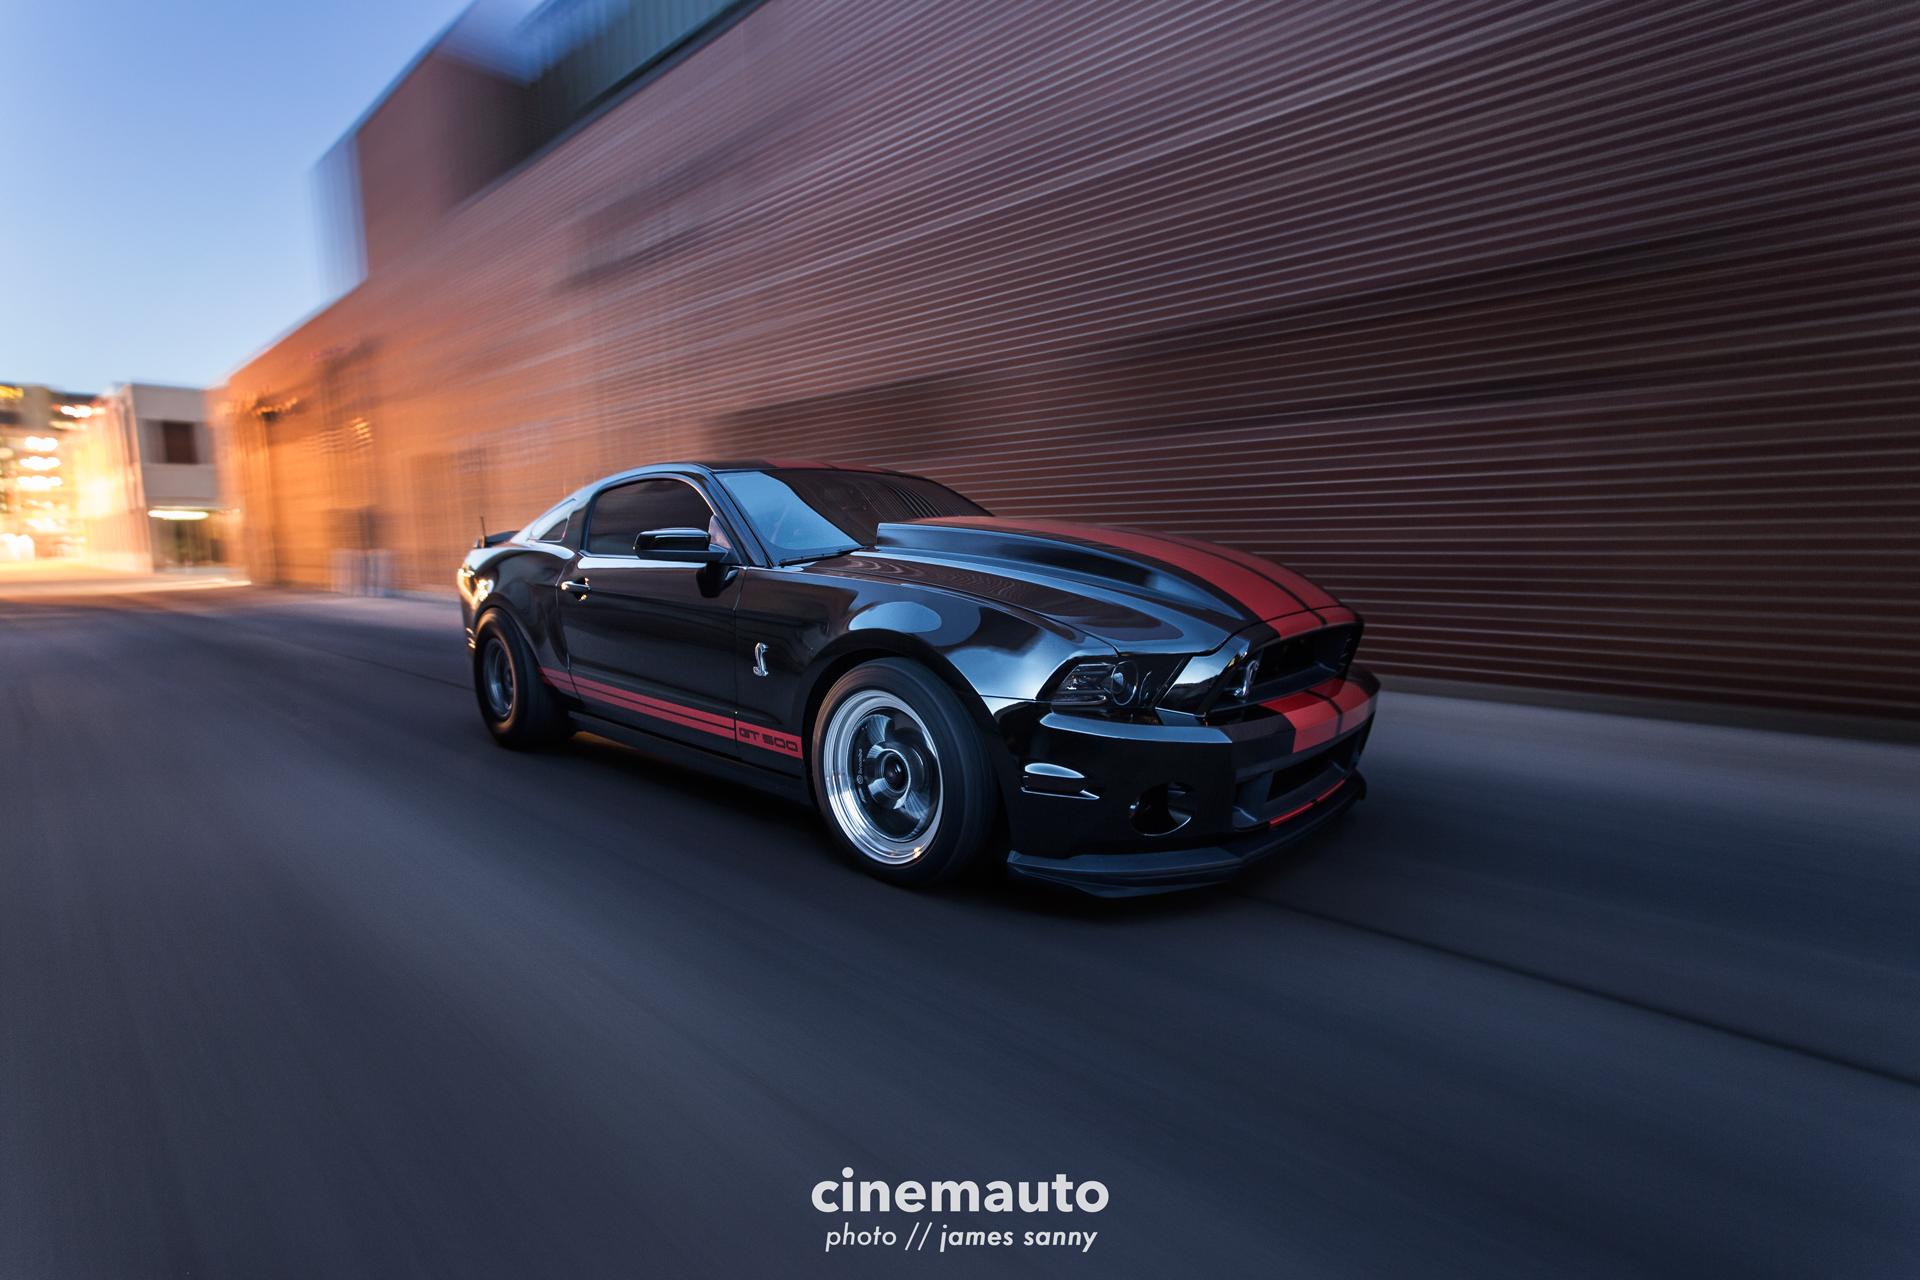 cinemauto-wichita-autmotive-photography-cj27a.jpg